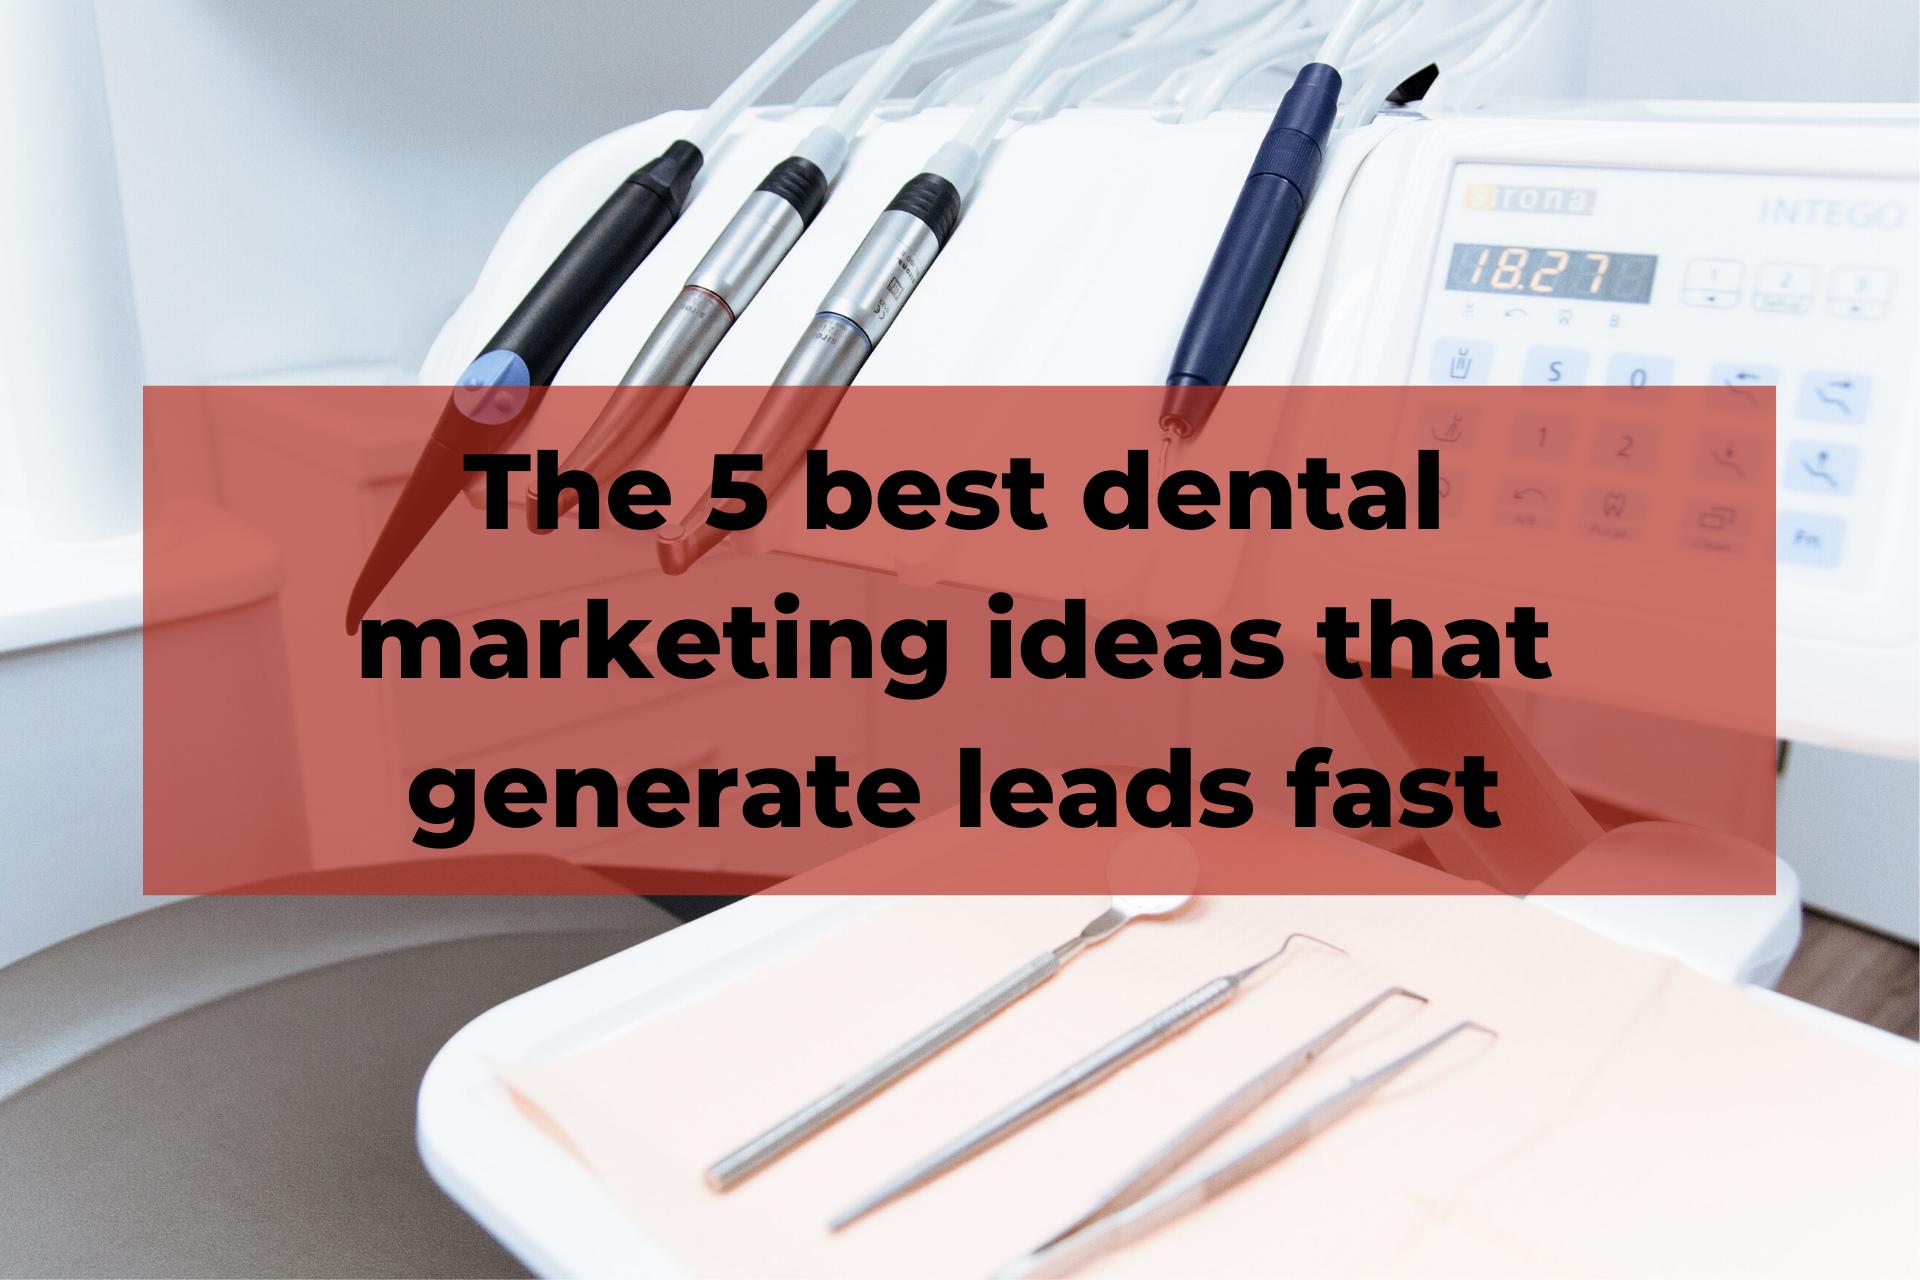 Best dental marketing ideas